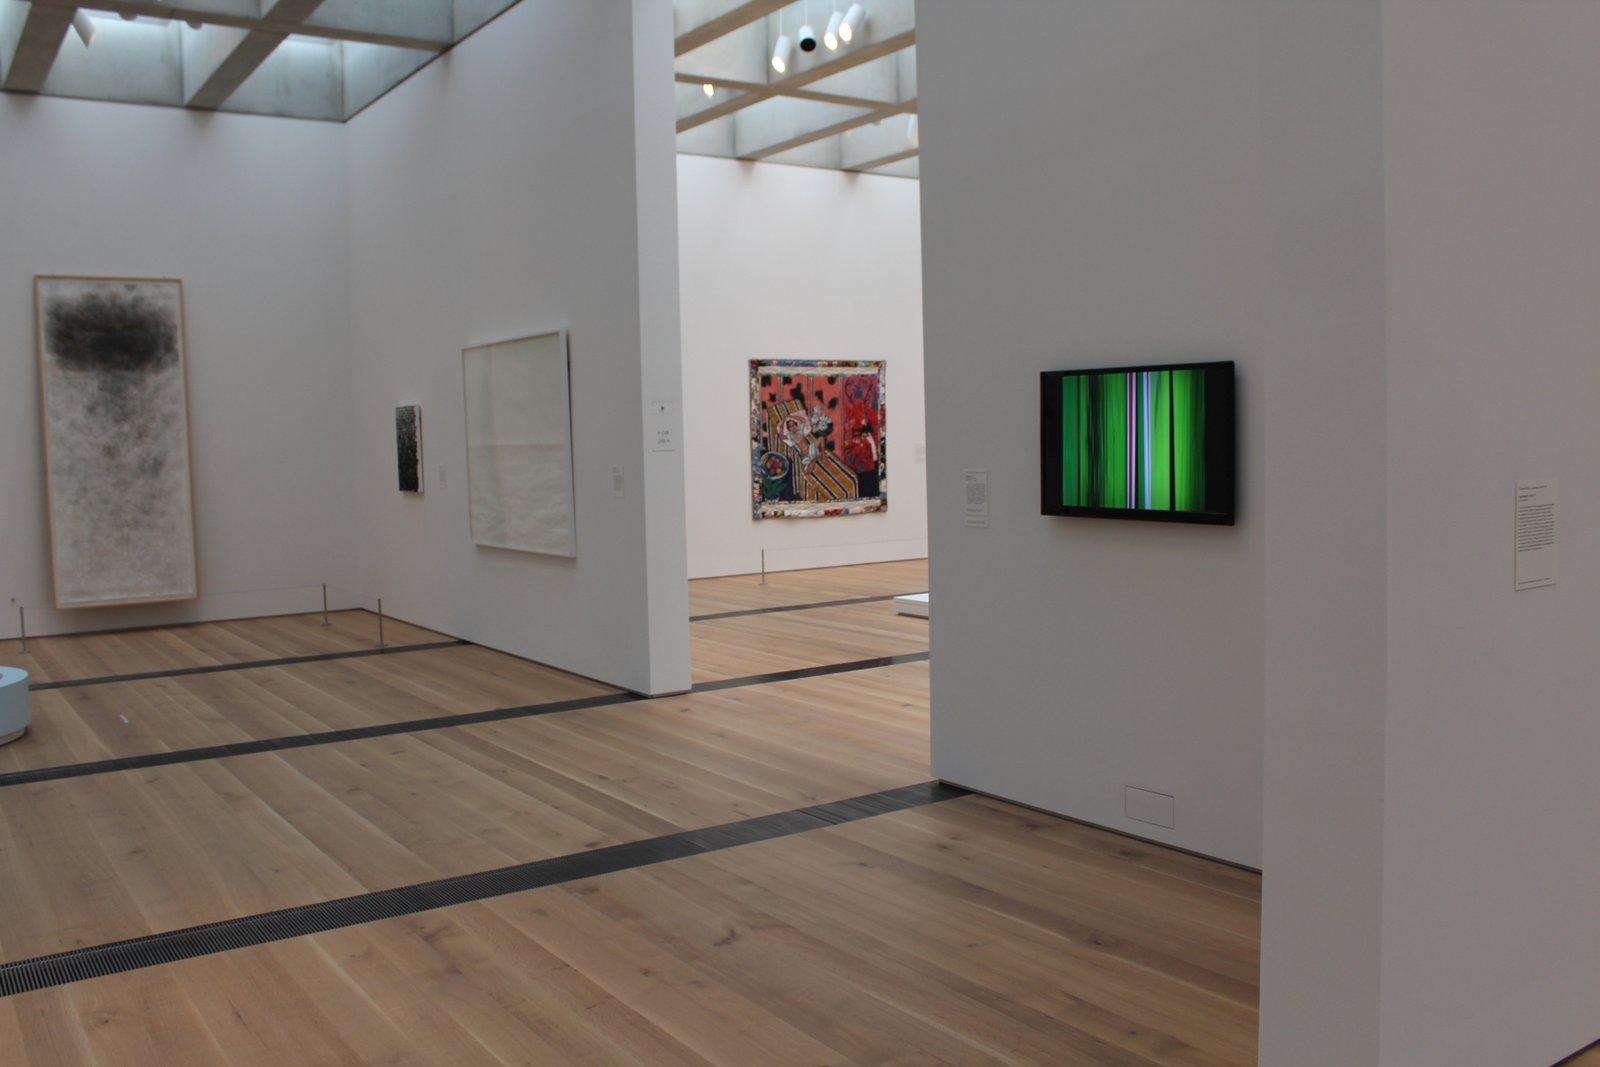 St Louis Art Museum – Quarter sawn White Oak flooring